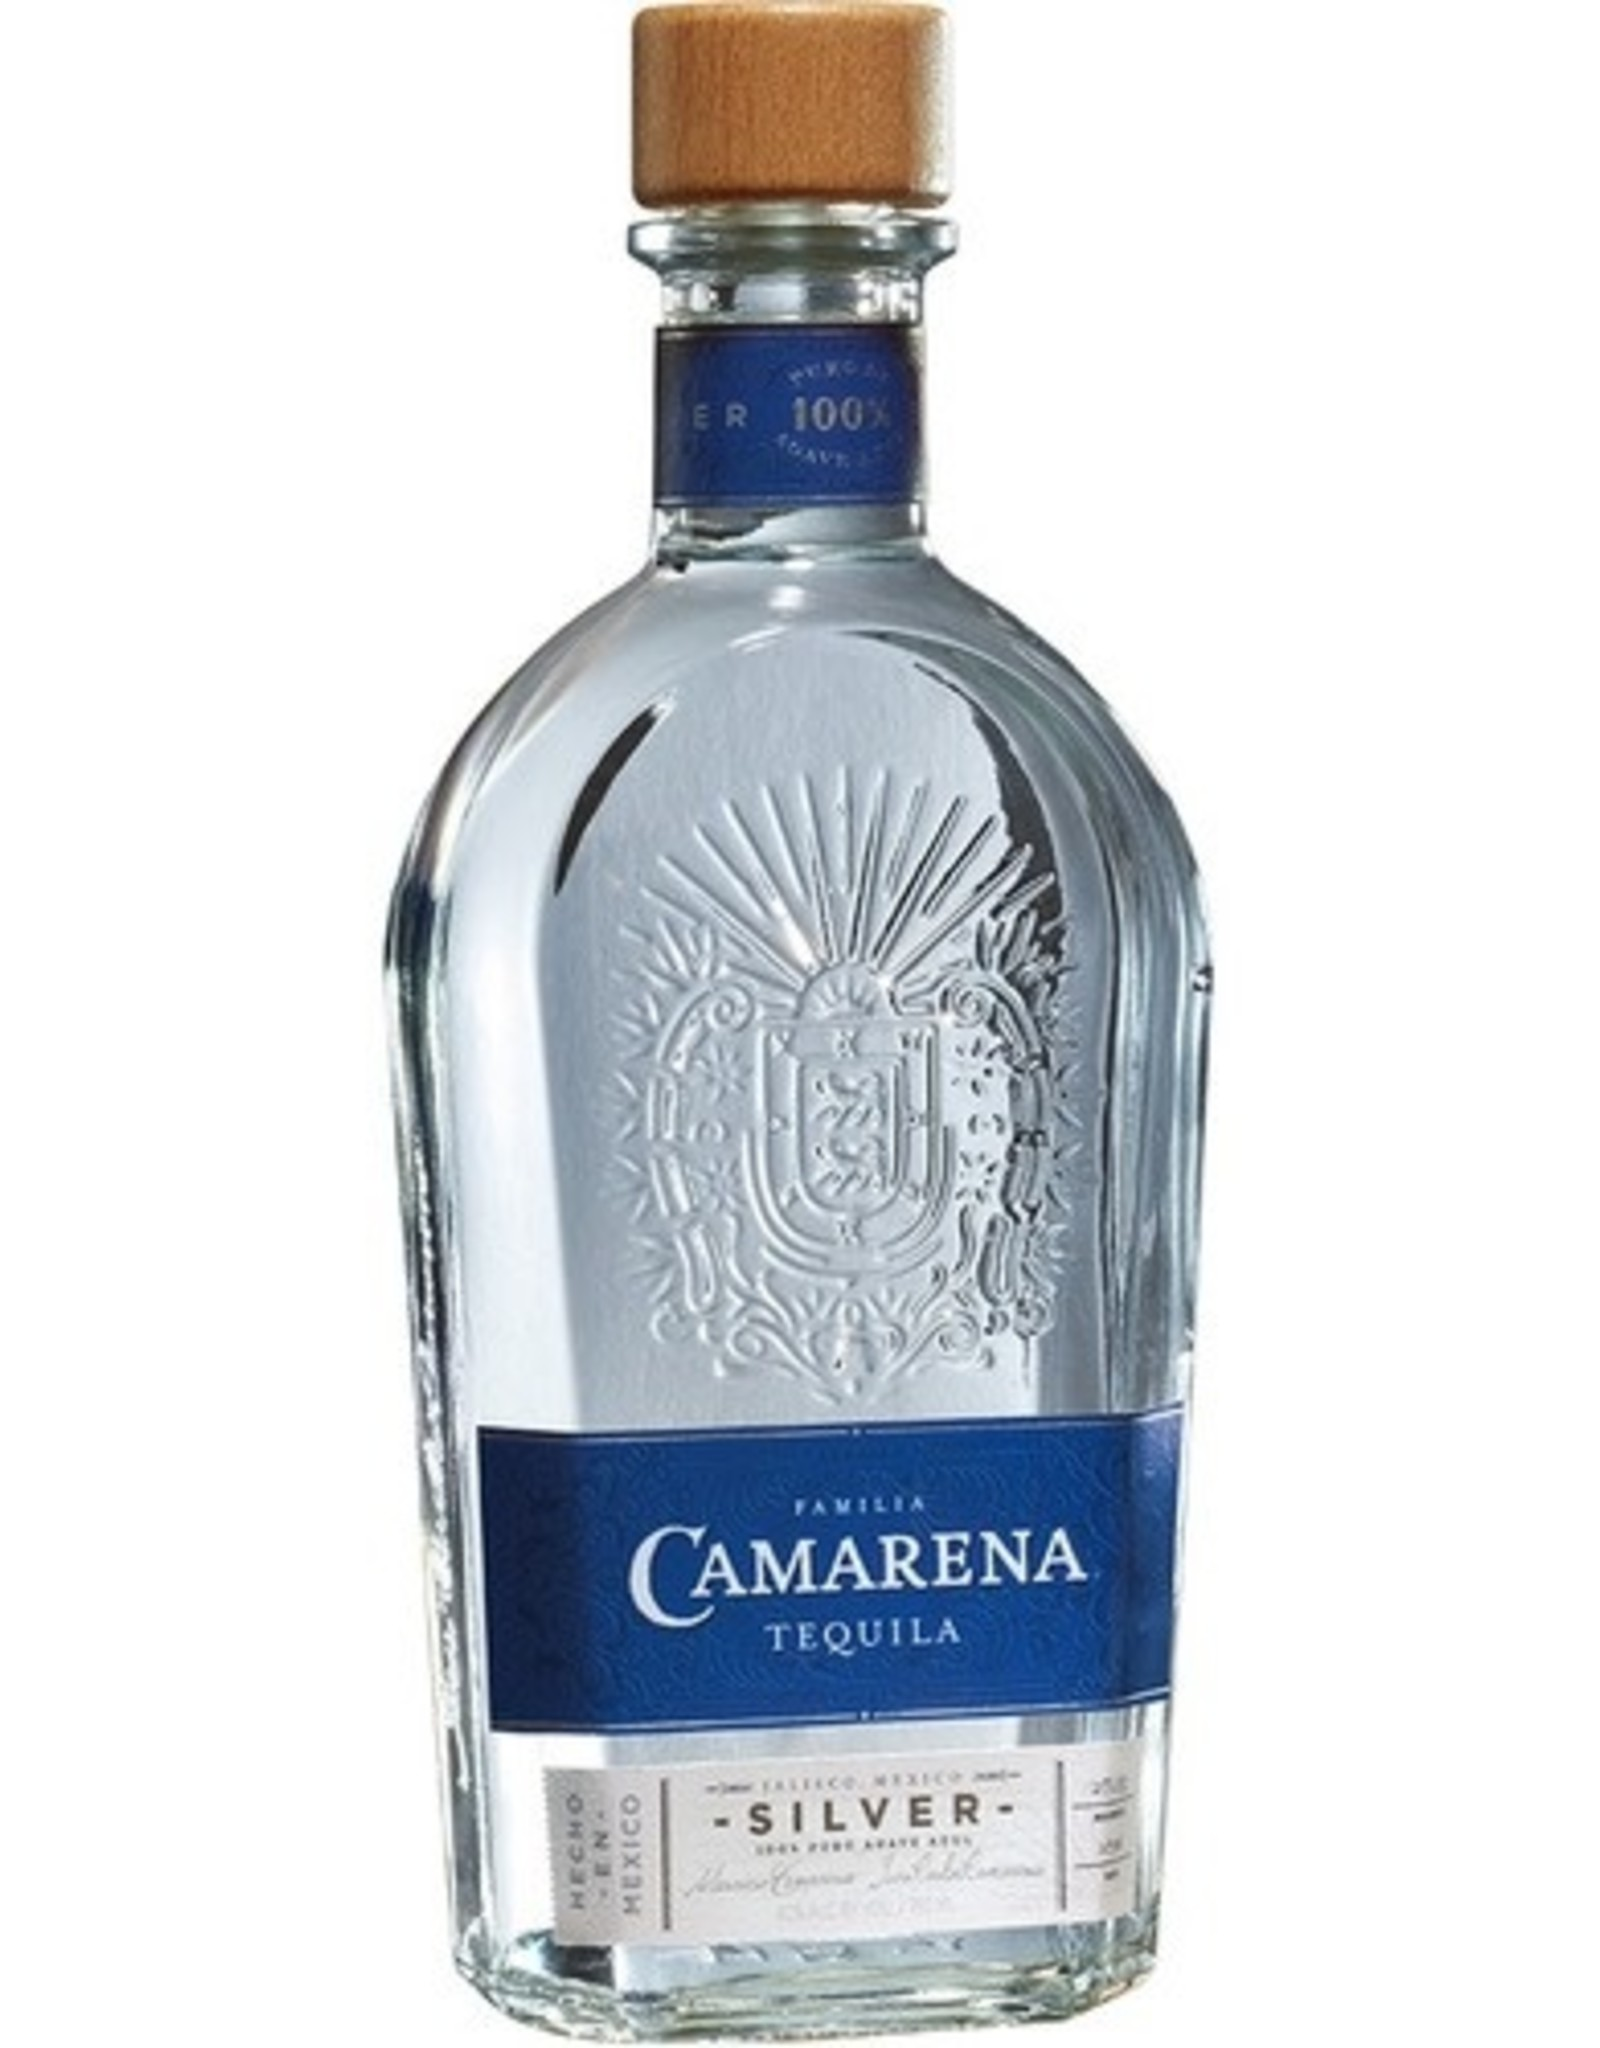 Camarena Camarena Tequila Silver 1.75L